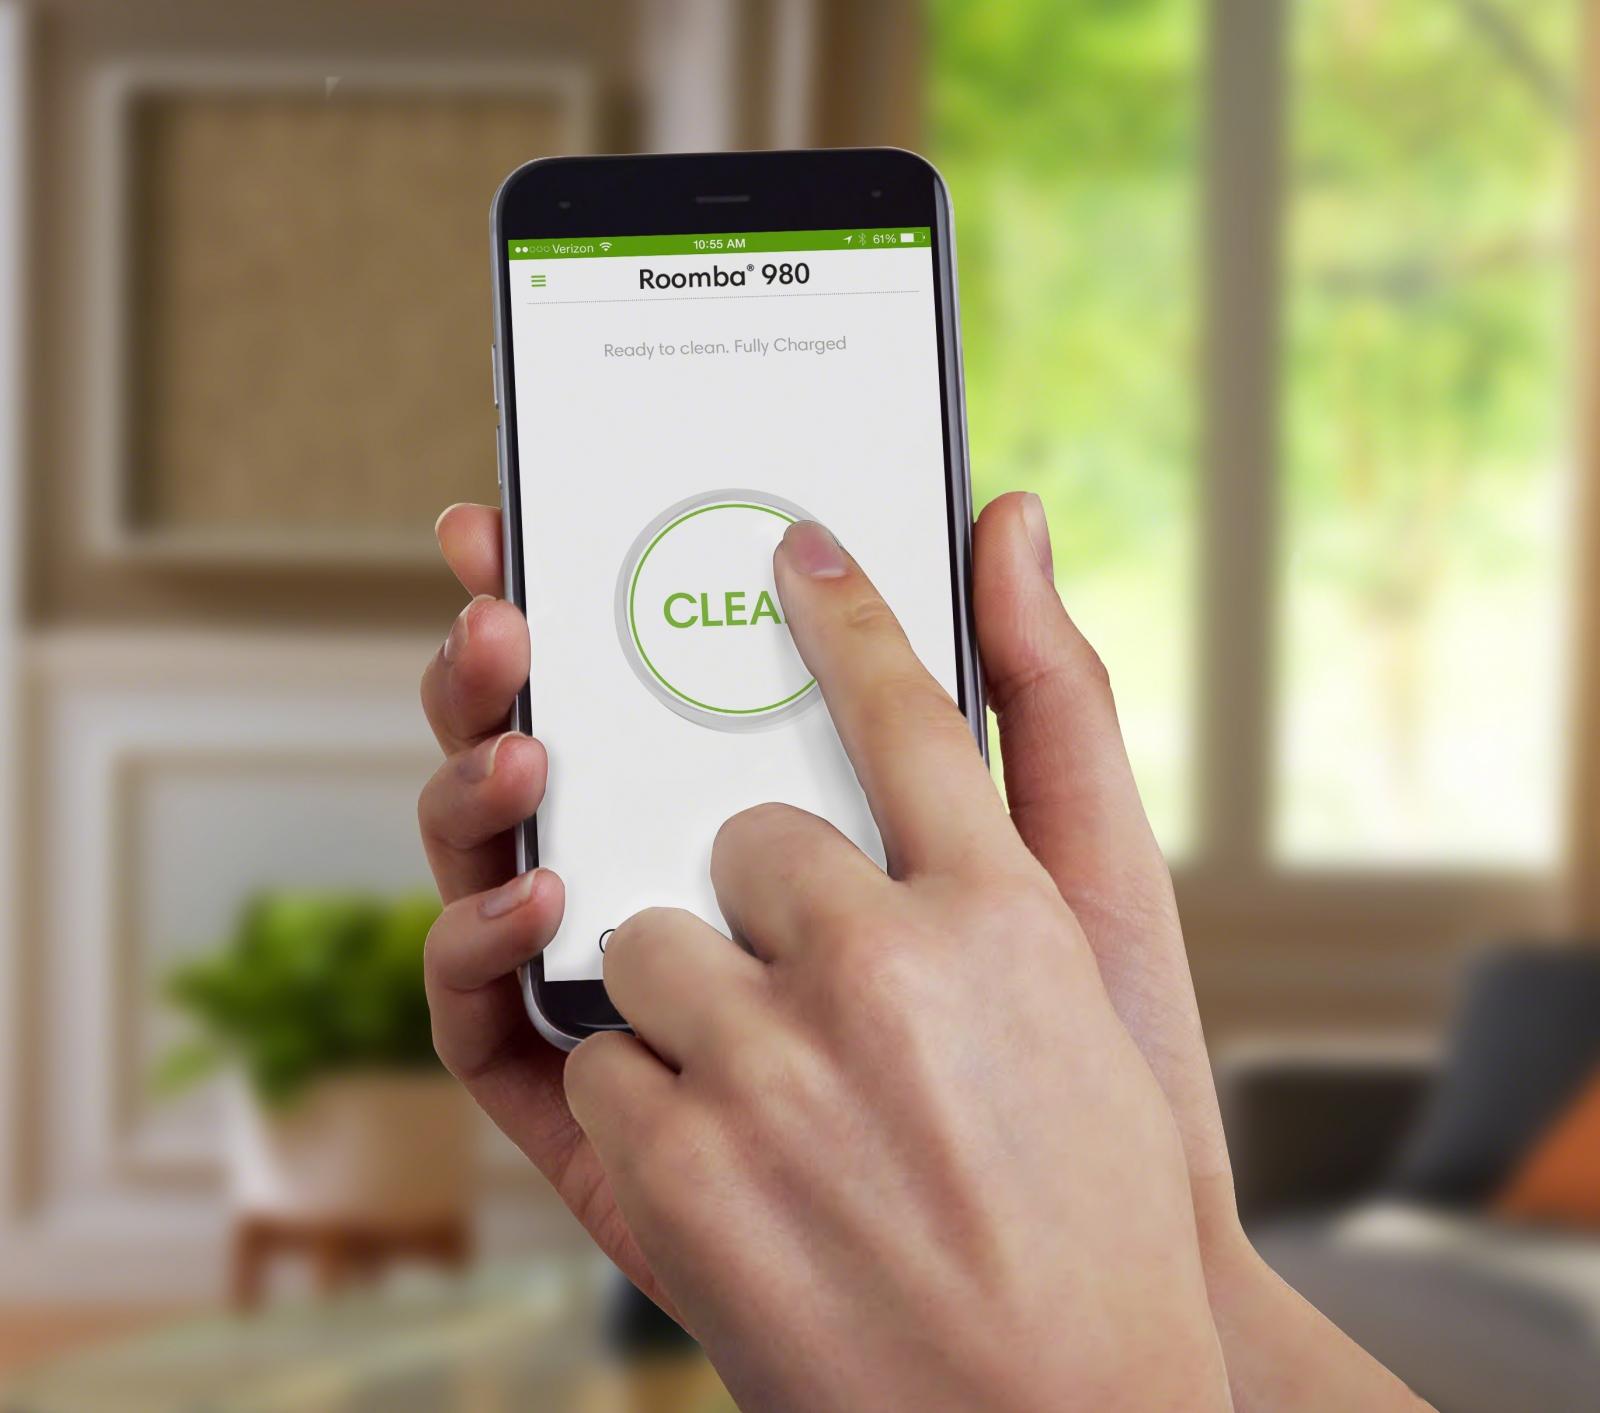 iRobot Roomba app